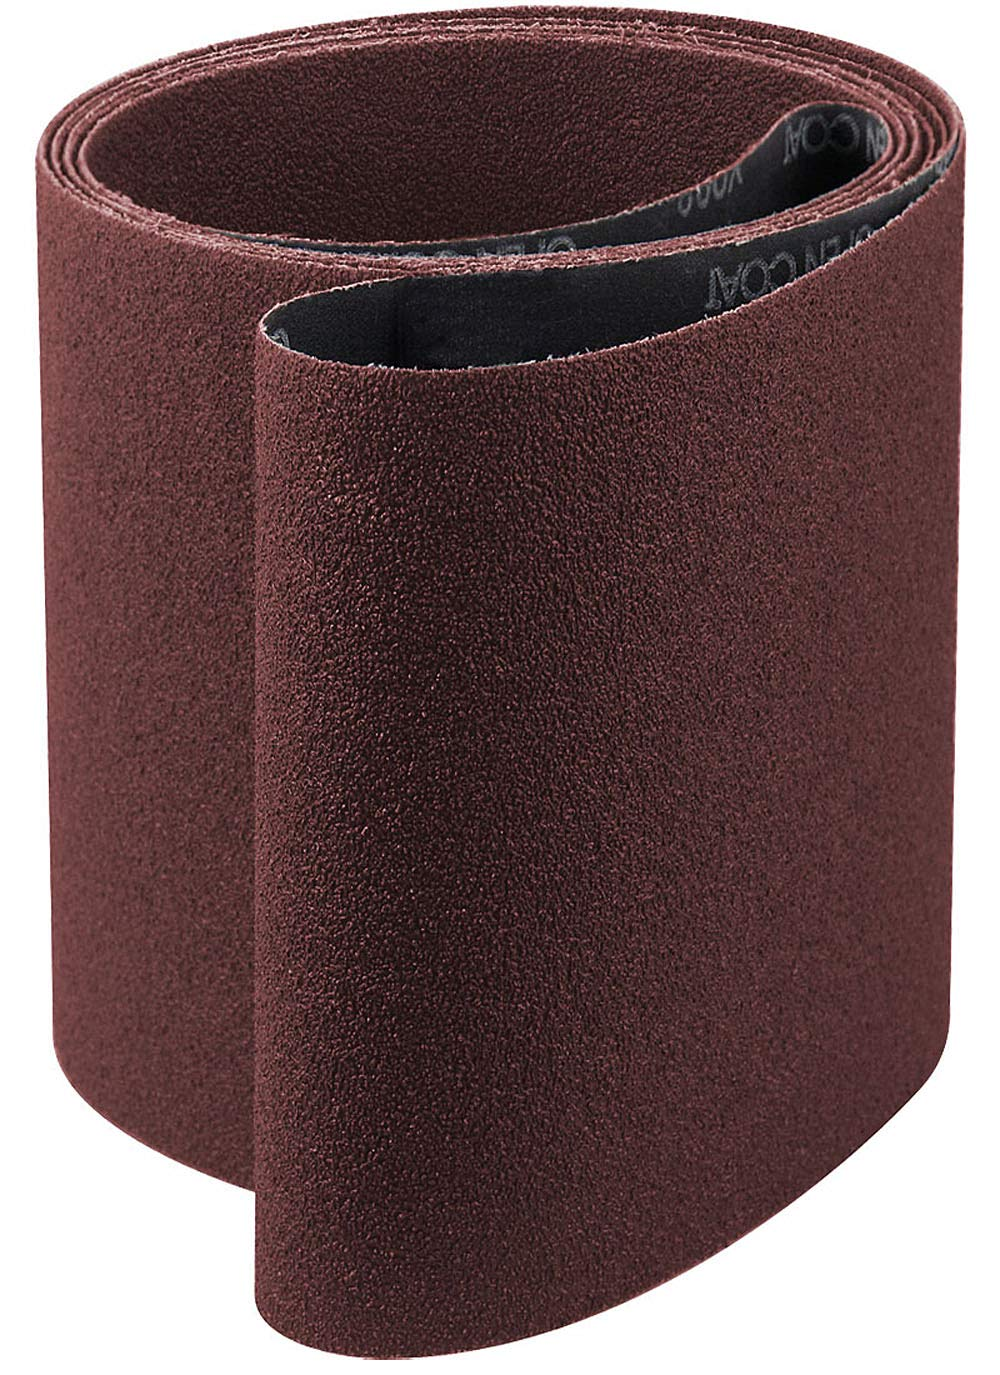 6x80 Aluminum Oxide 80 Grit Sander Belt, x-weight<br>A&H Abrasives 933020x5, 5-pack